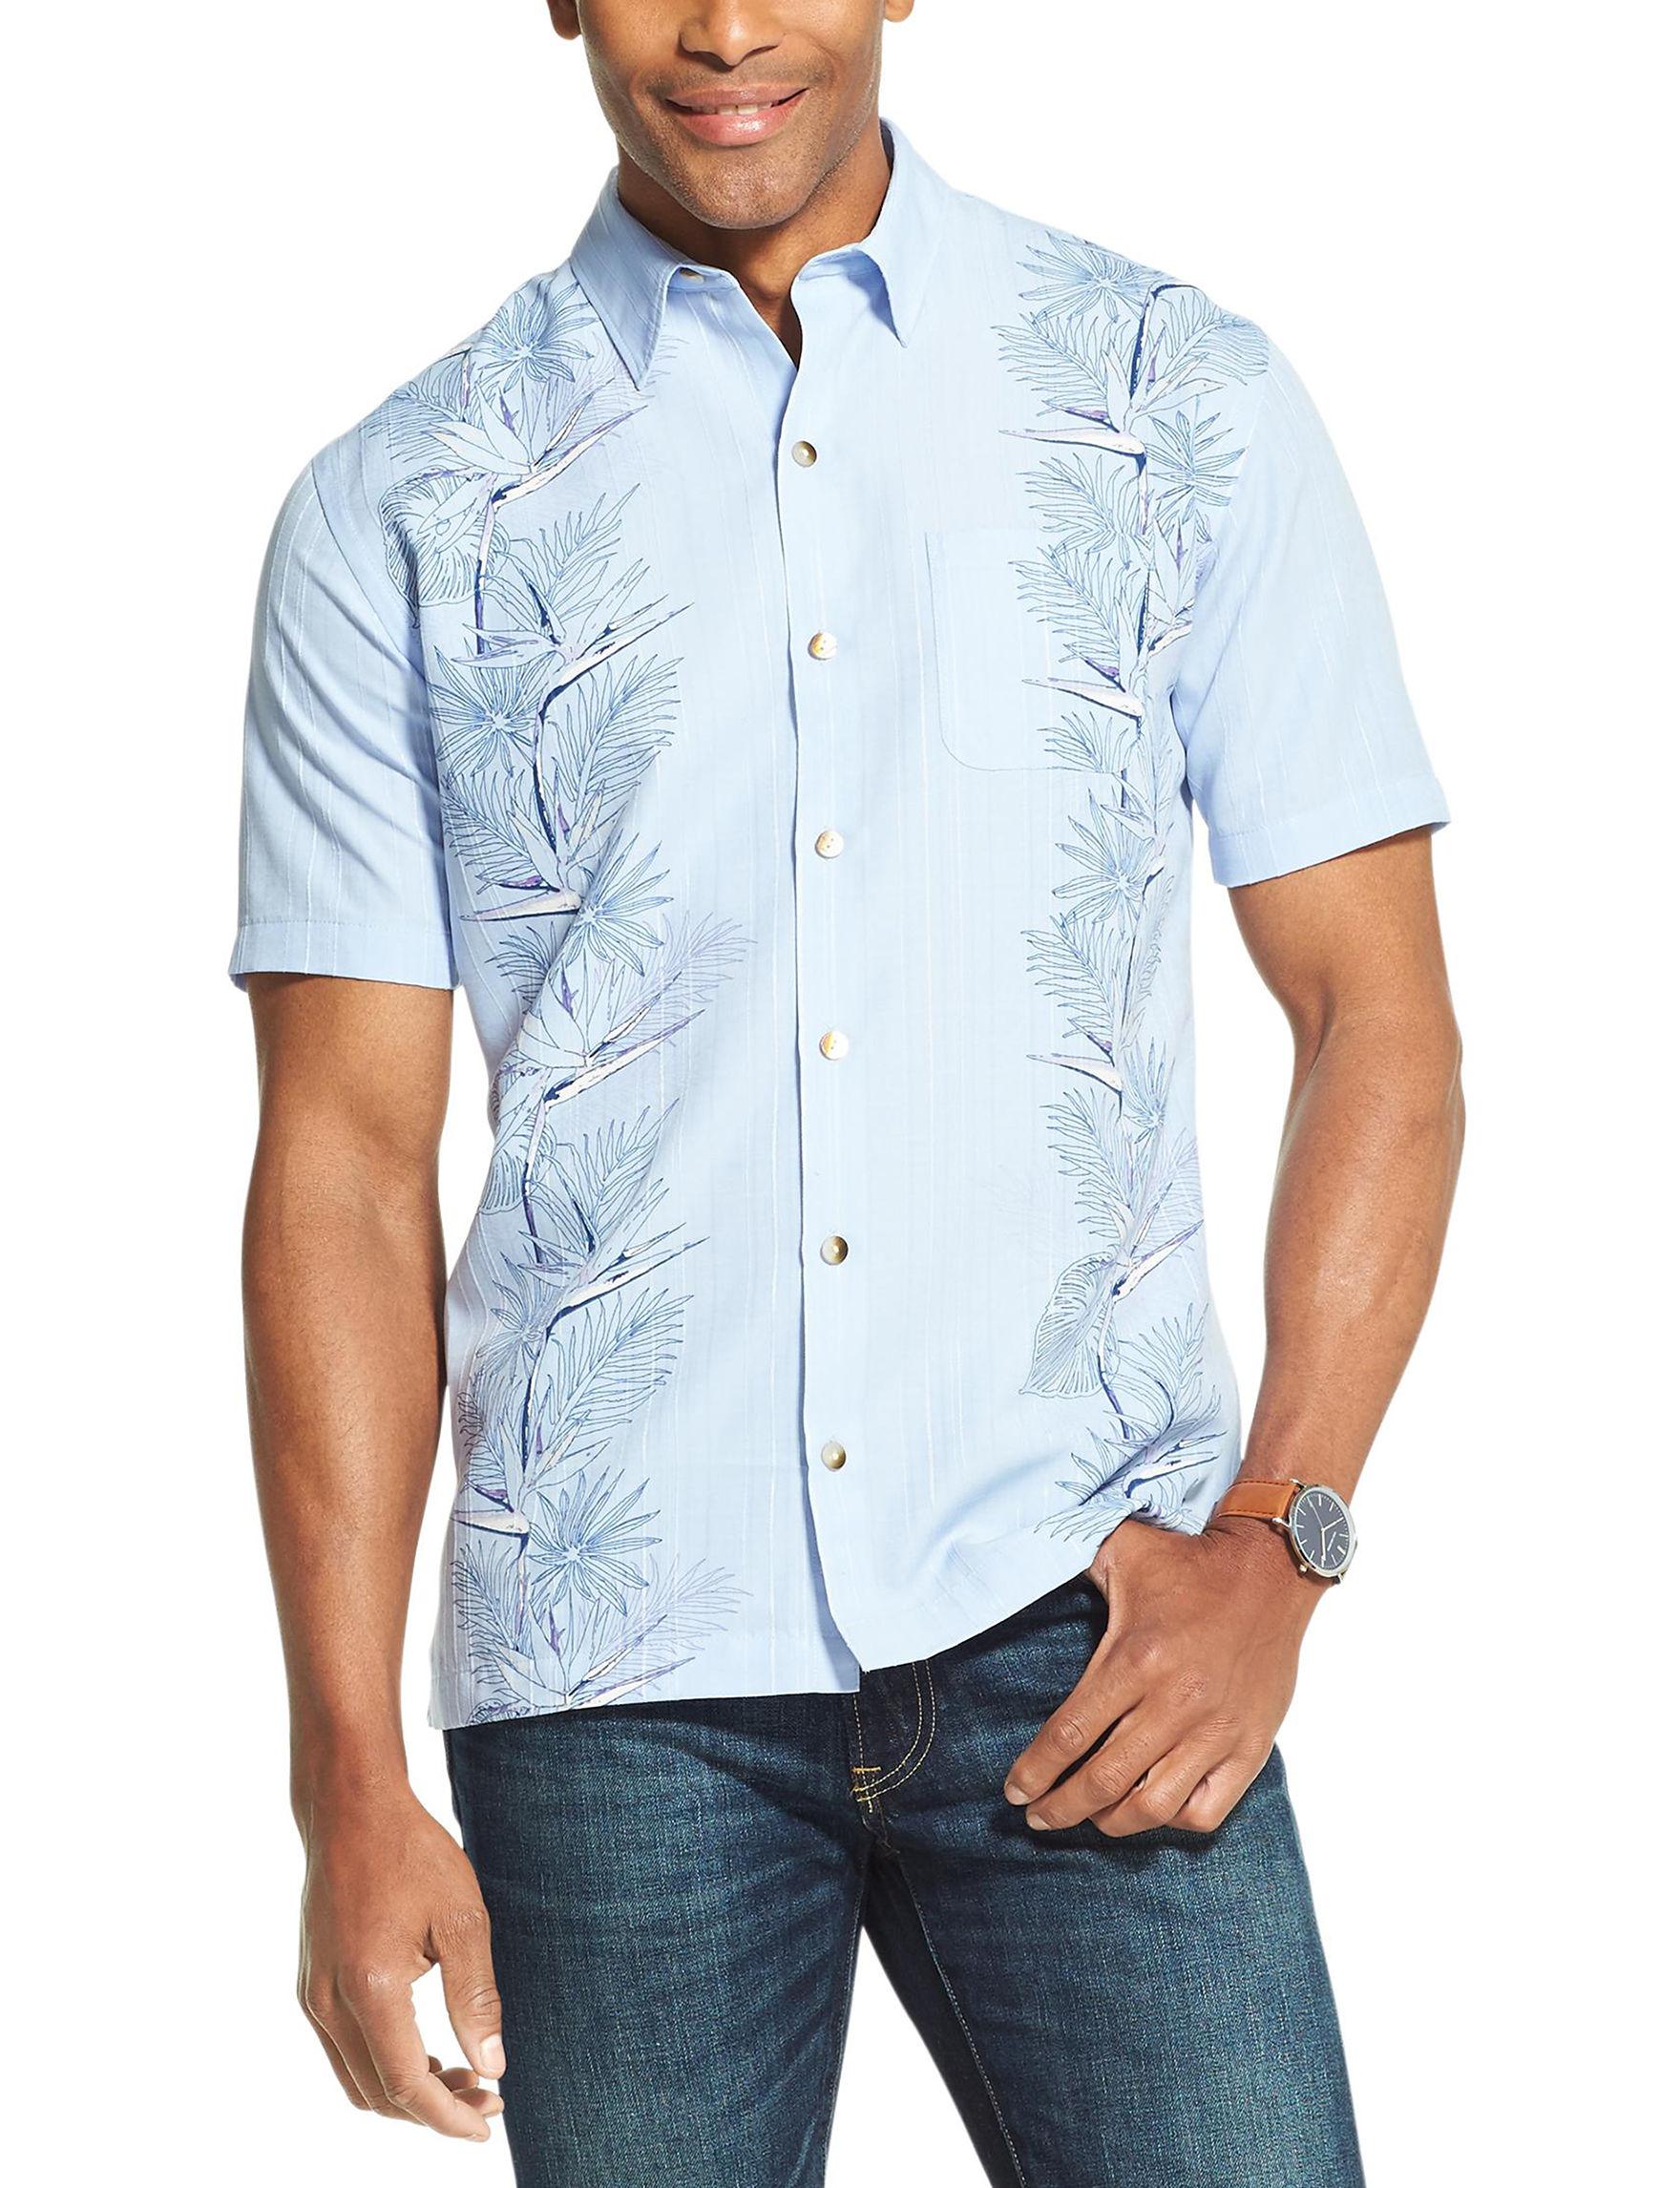 Van Heusen Blue Ice Casual Button Down Shirts